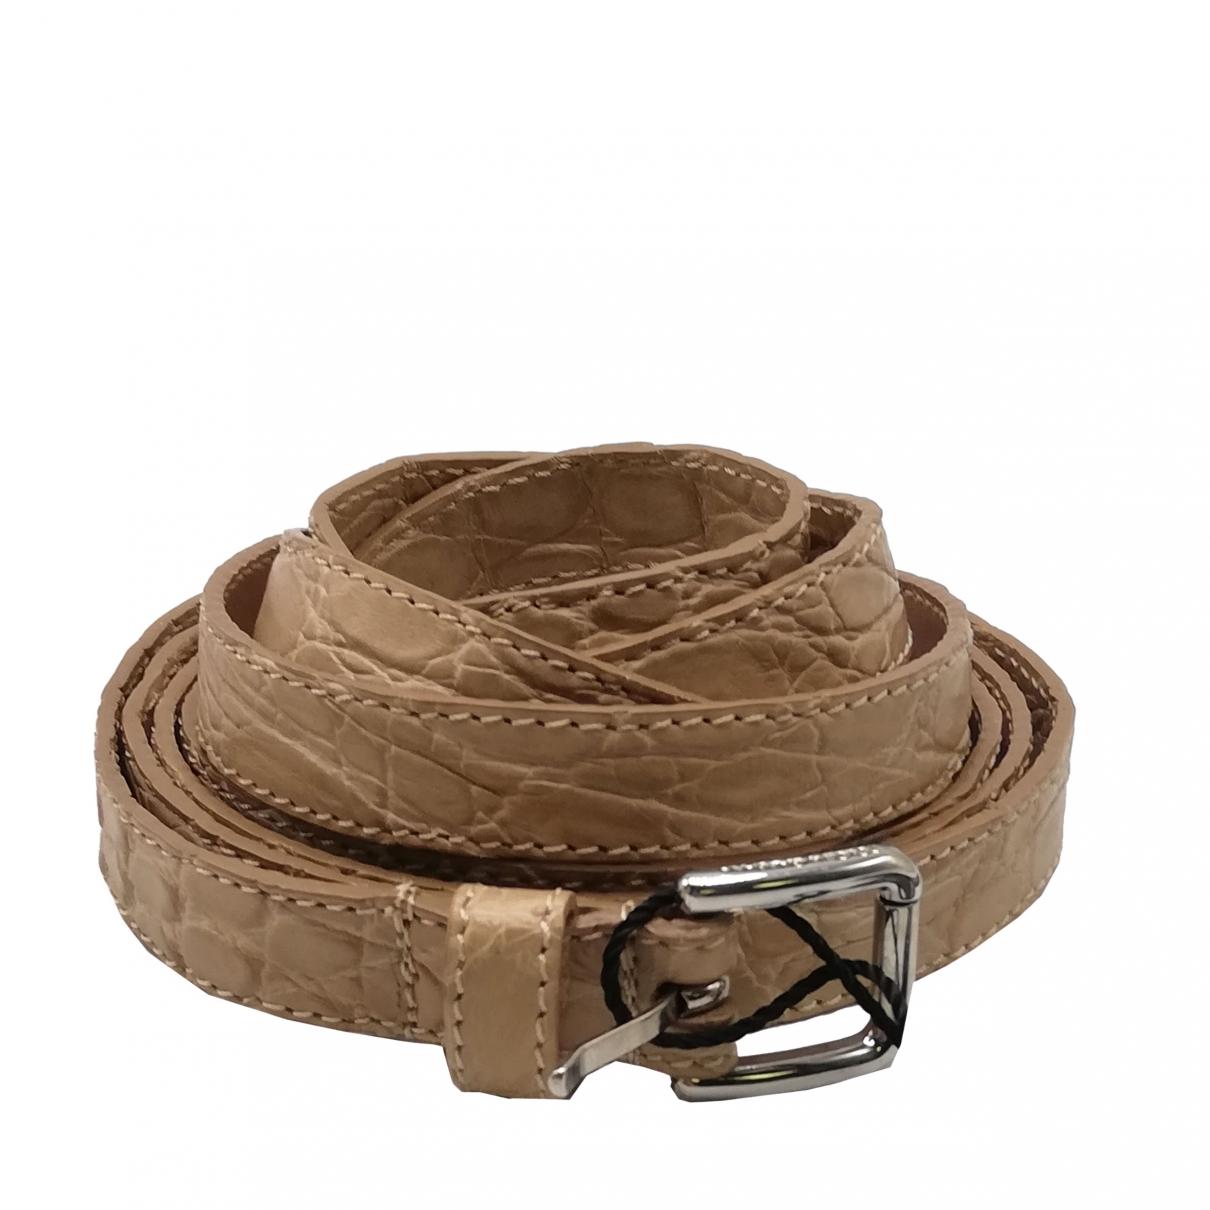 Cinturon de Cocodrilo Dolce & Gabbana